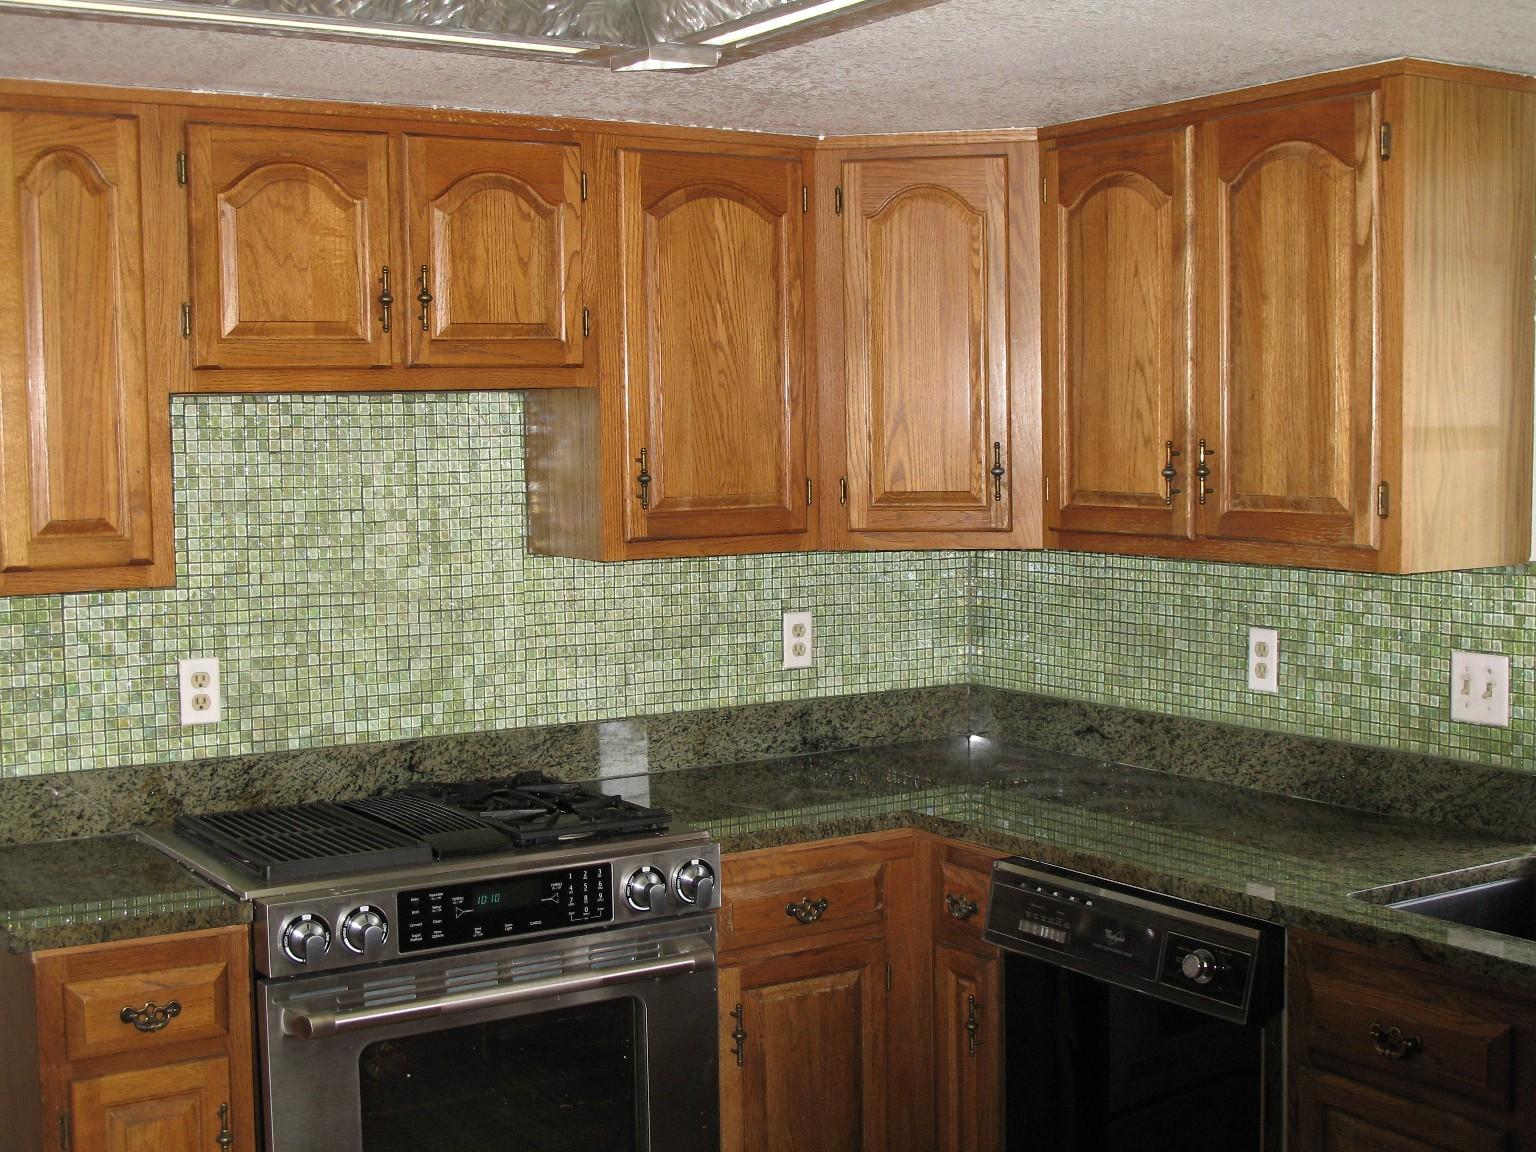 kitchen backsplash tiles ideas on budget kitchen backsplash tile Kitchen backsplash ideas